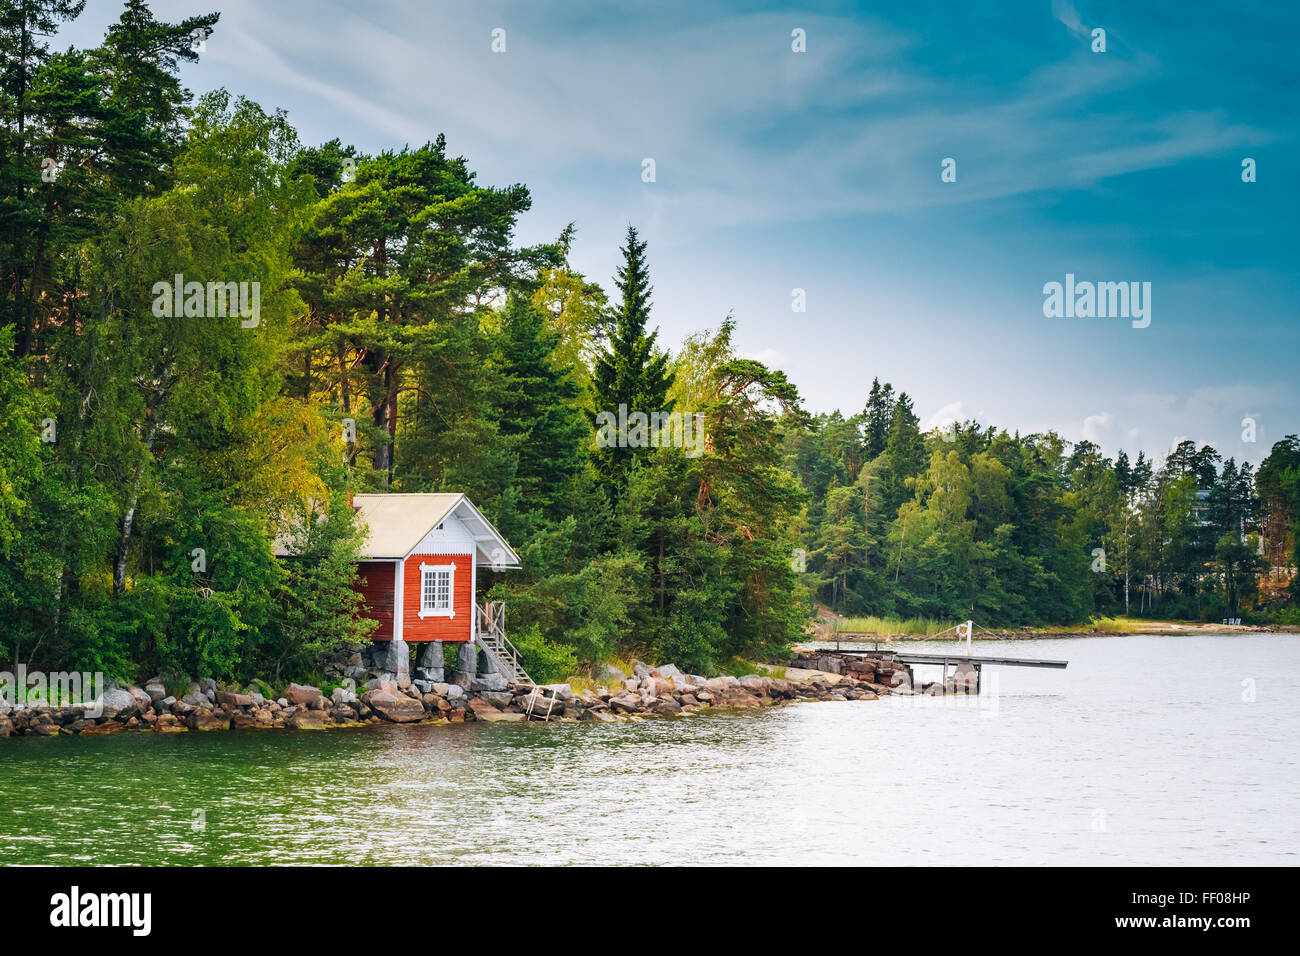 Red Finnish Wooden Sauna Log Cabin On Island In Summer - Stock Image